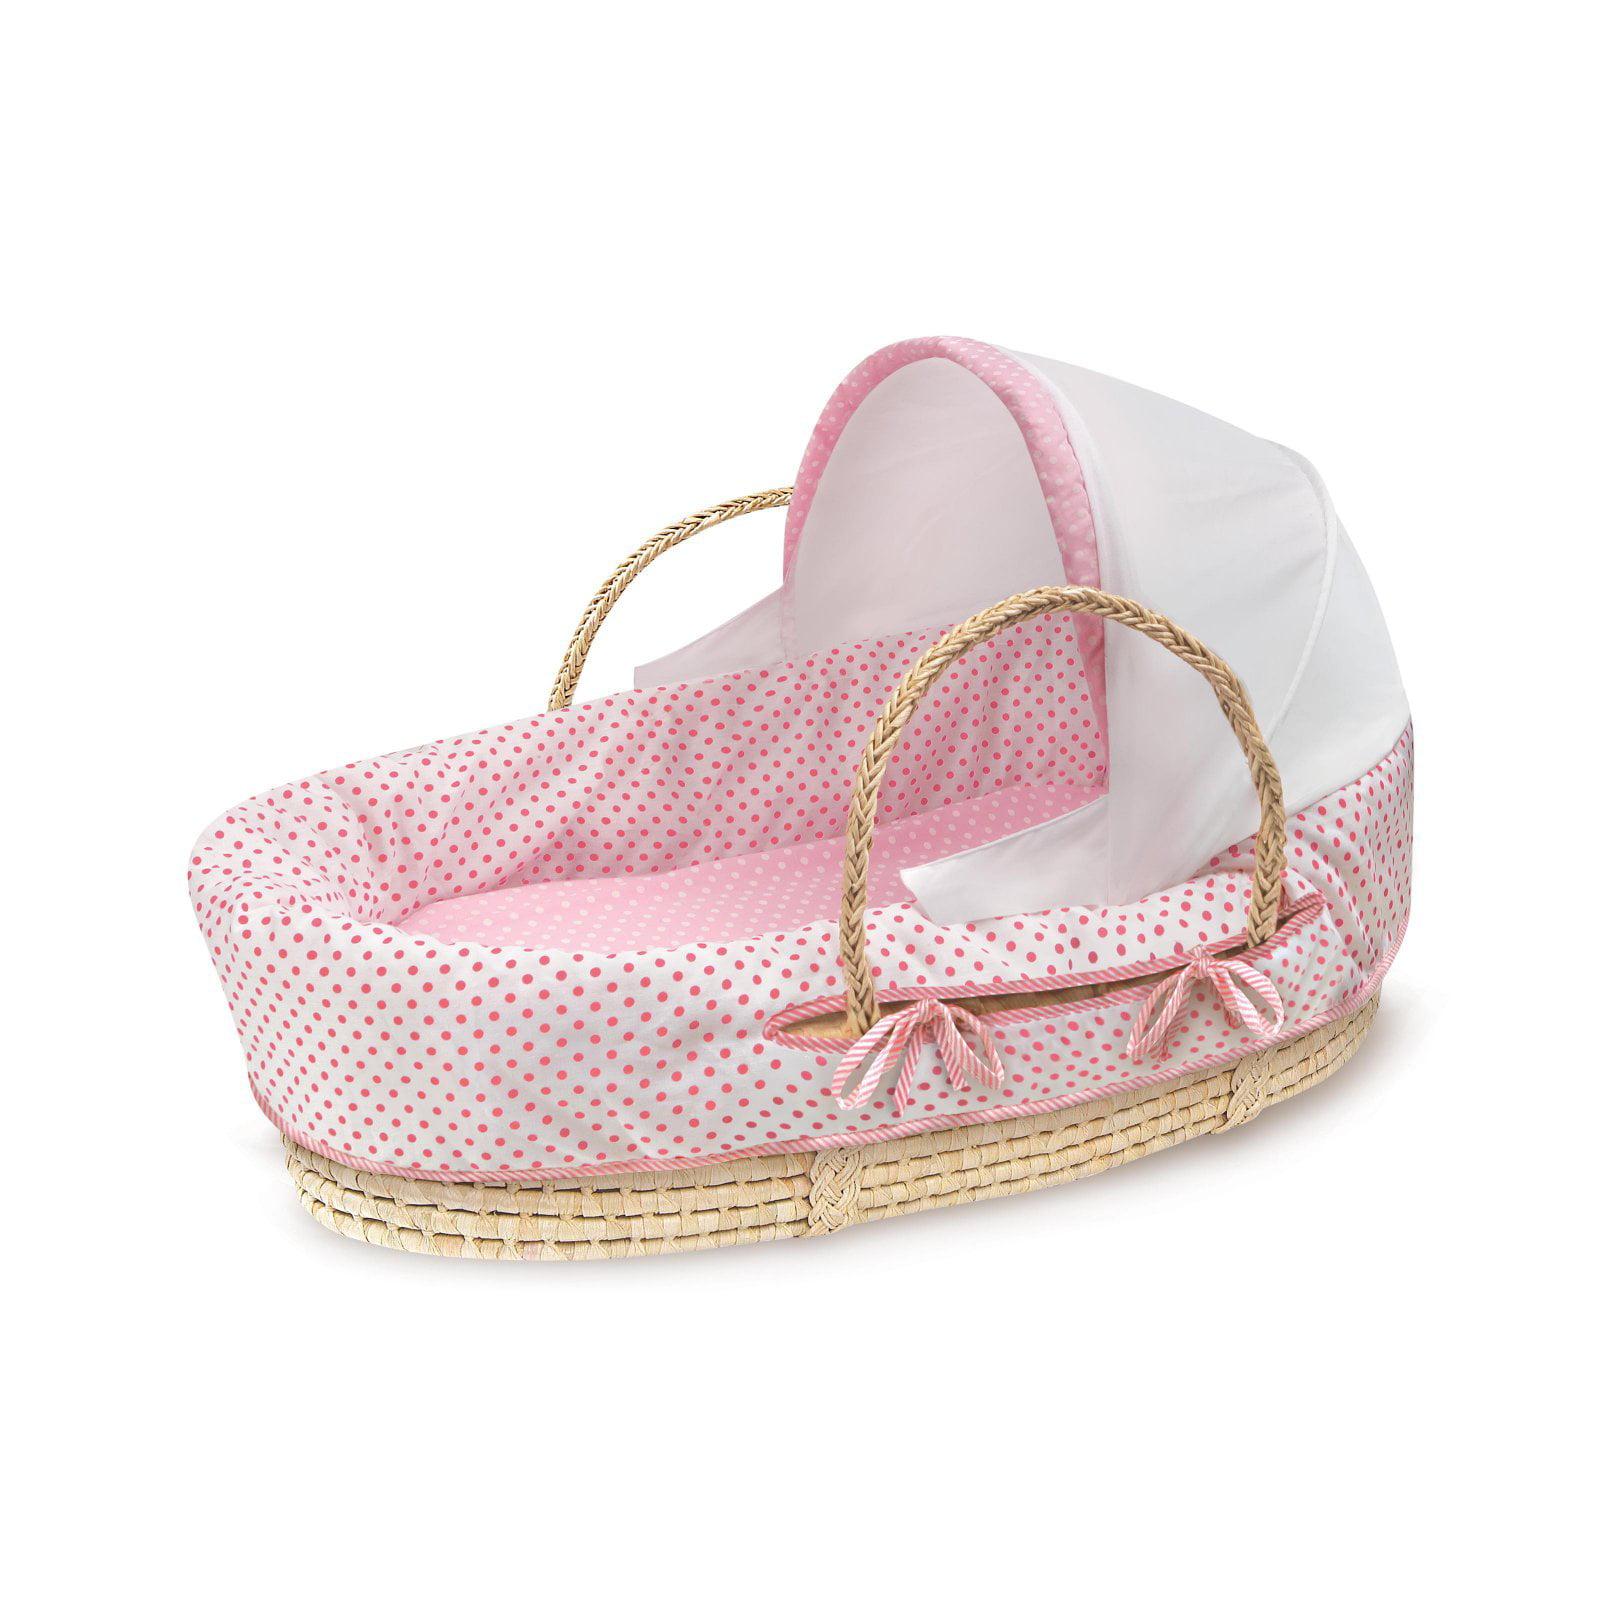 Badger Basket Natural Moses Basket with Fabric Canopy, Pink Polka Dot